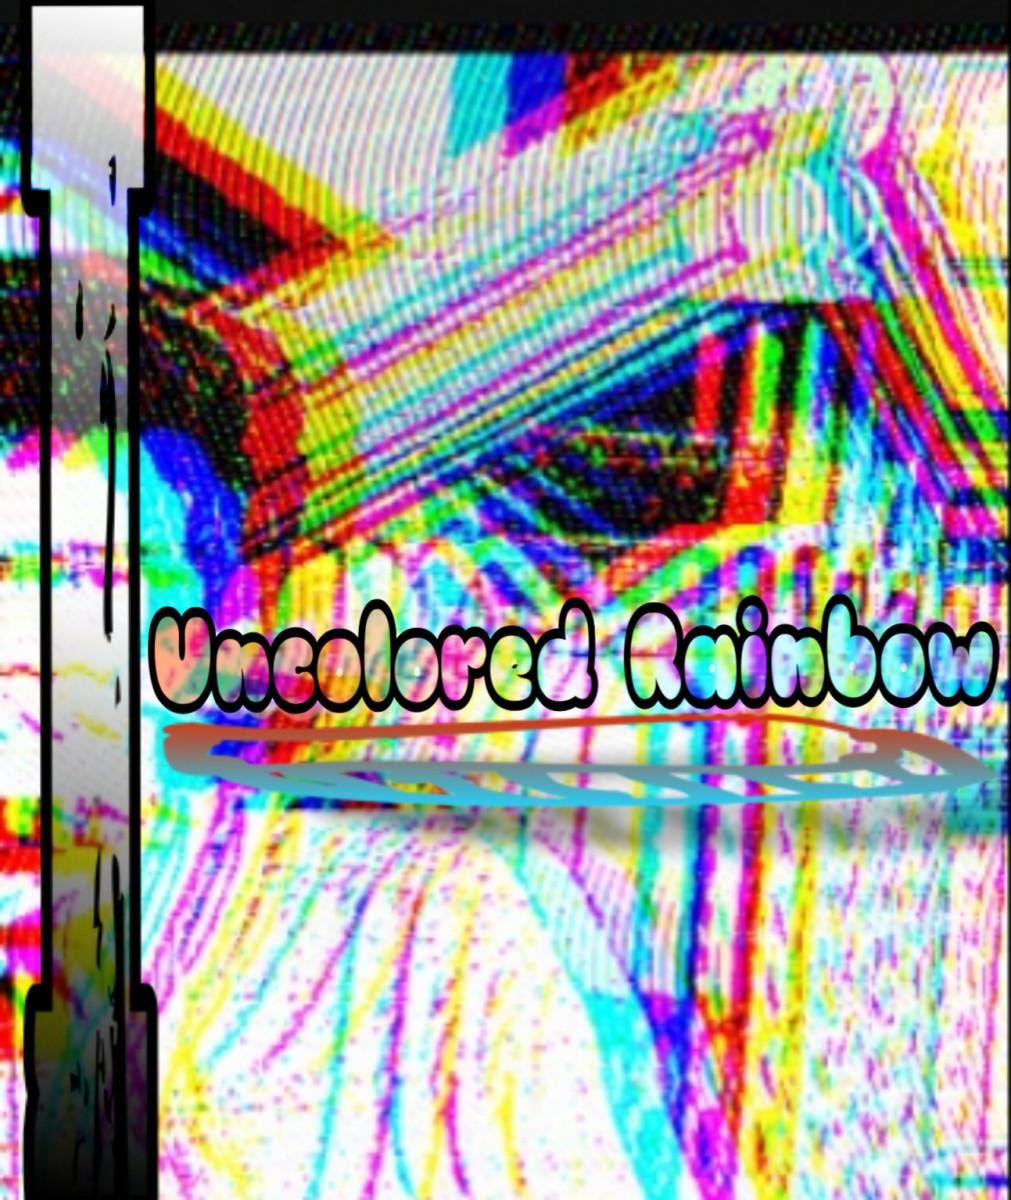 uncolored-rainbow